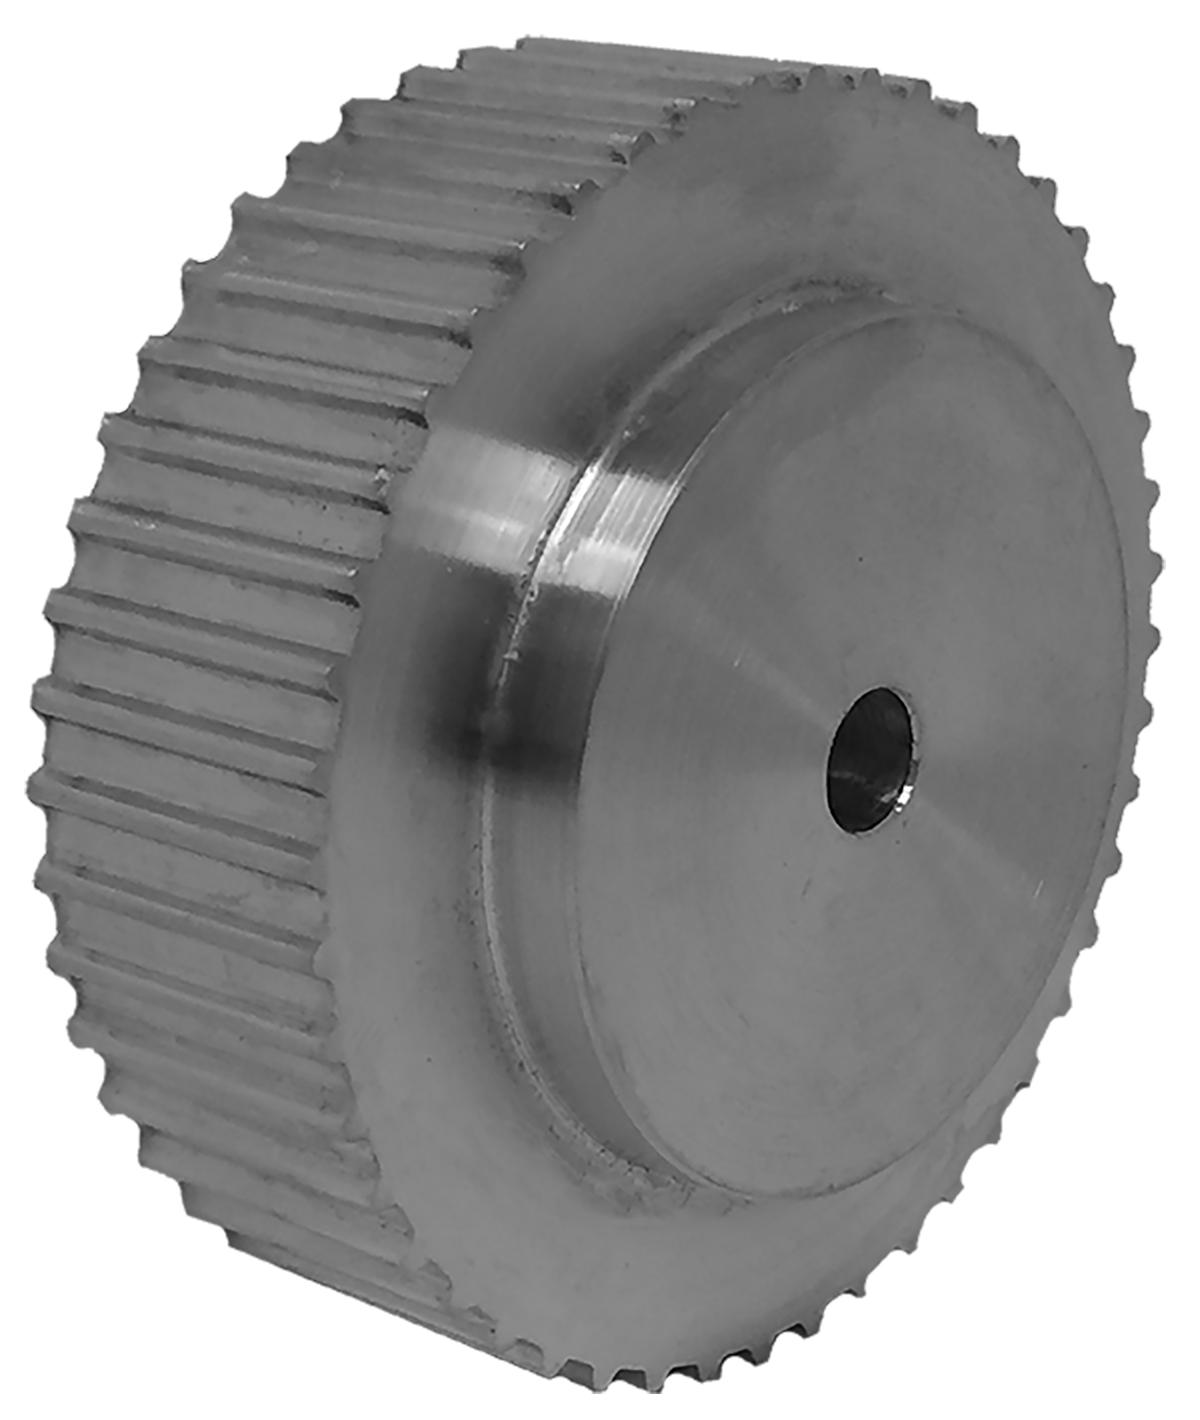 27AT5/48-0 - Aluminum Metric Pulleys